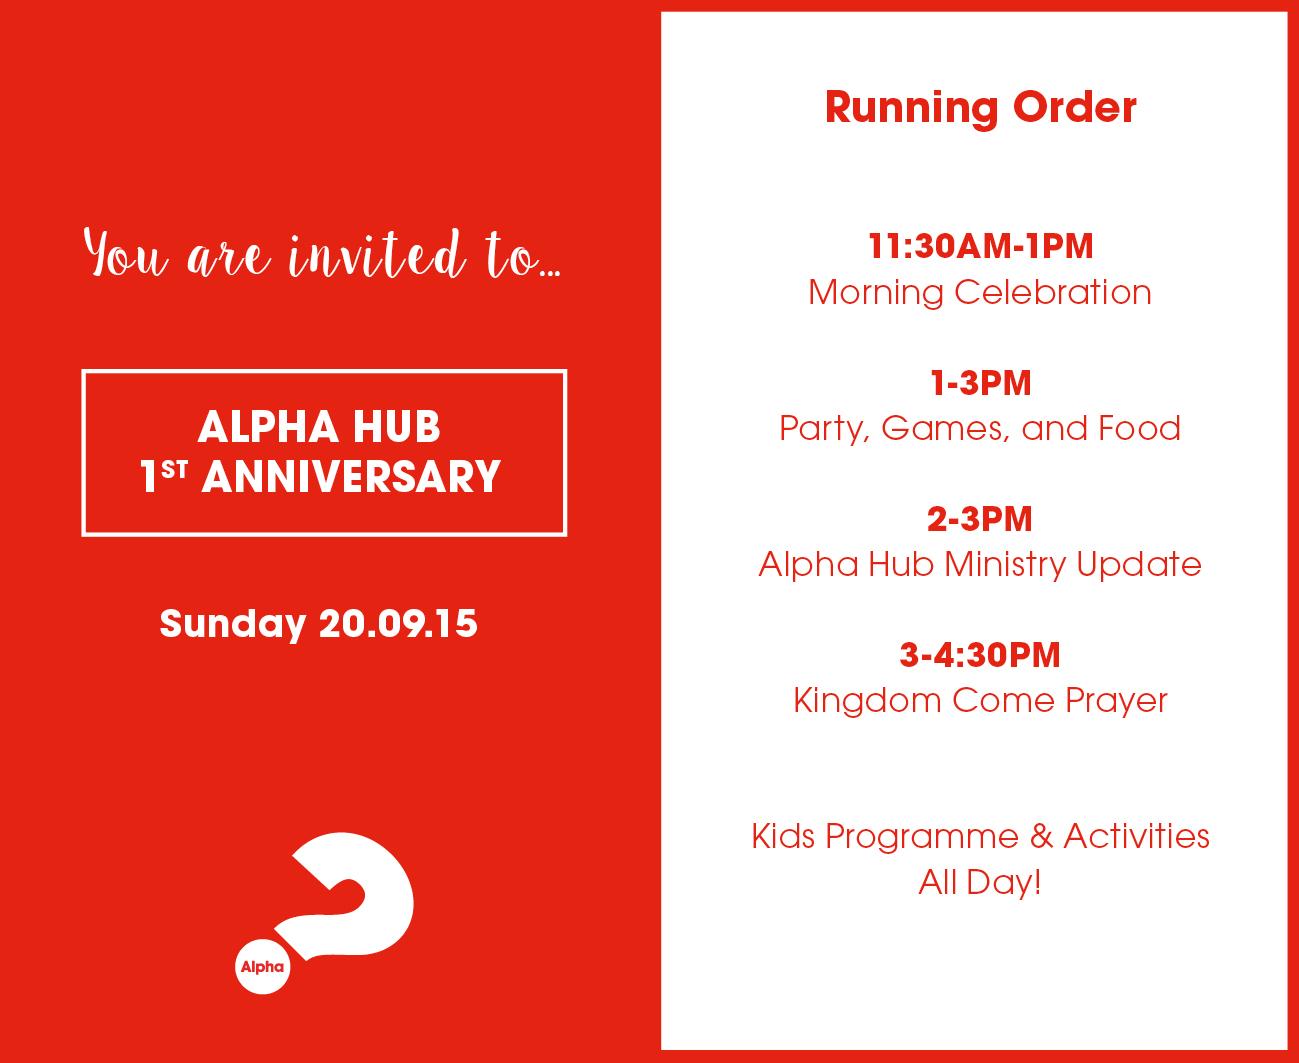 AlphaHub_invites-v2[6].jpg